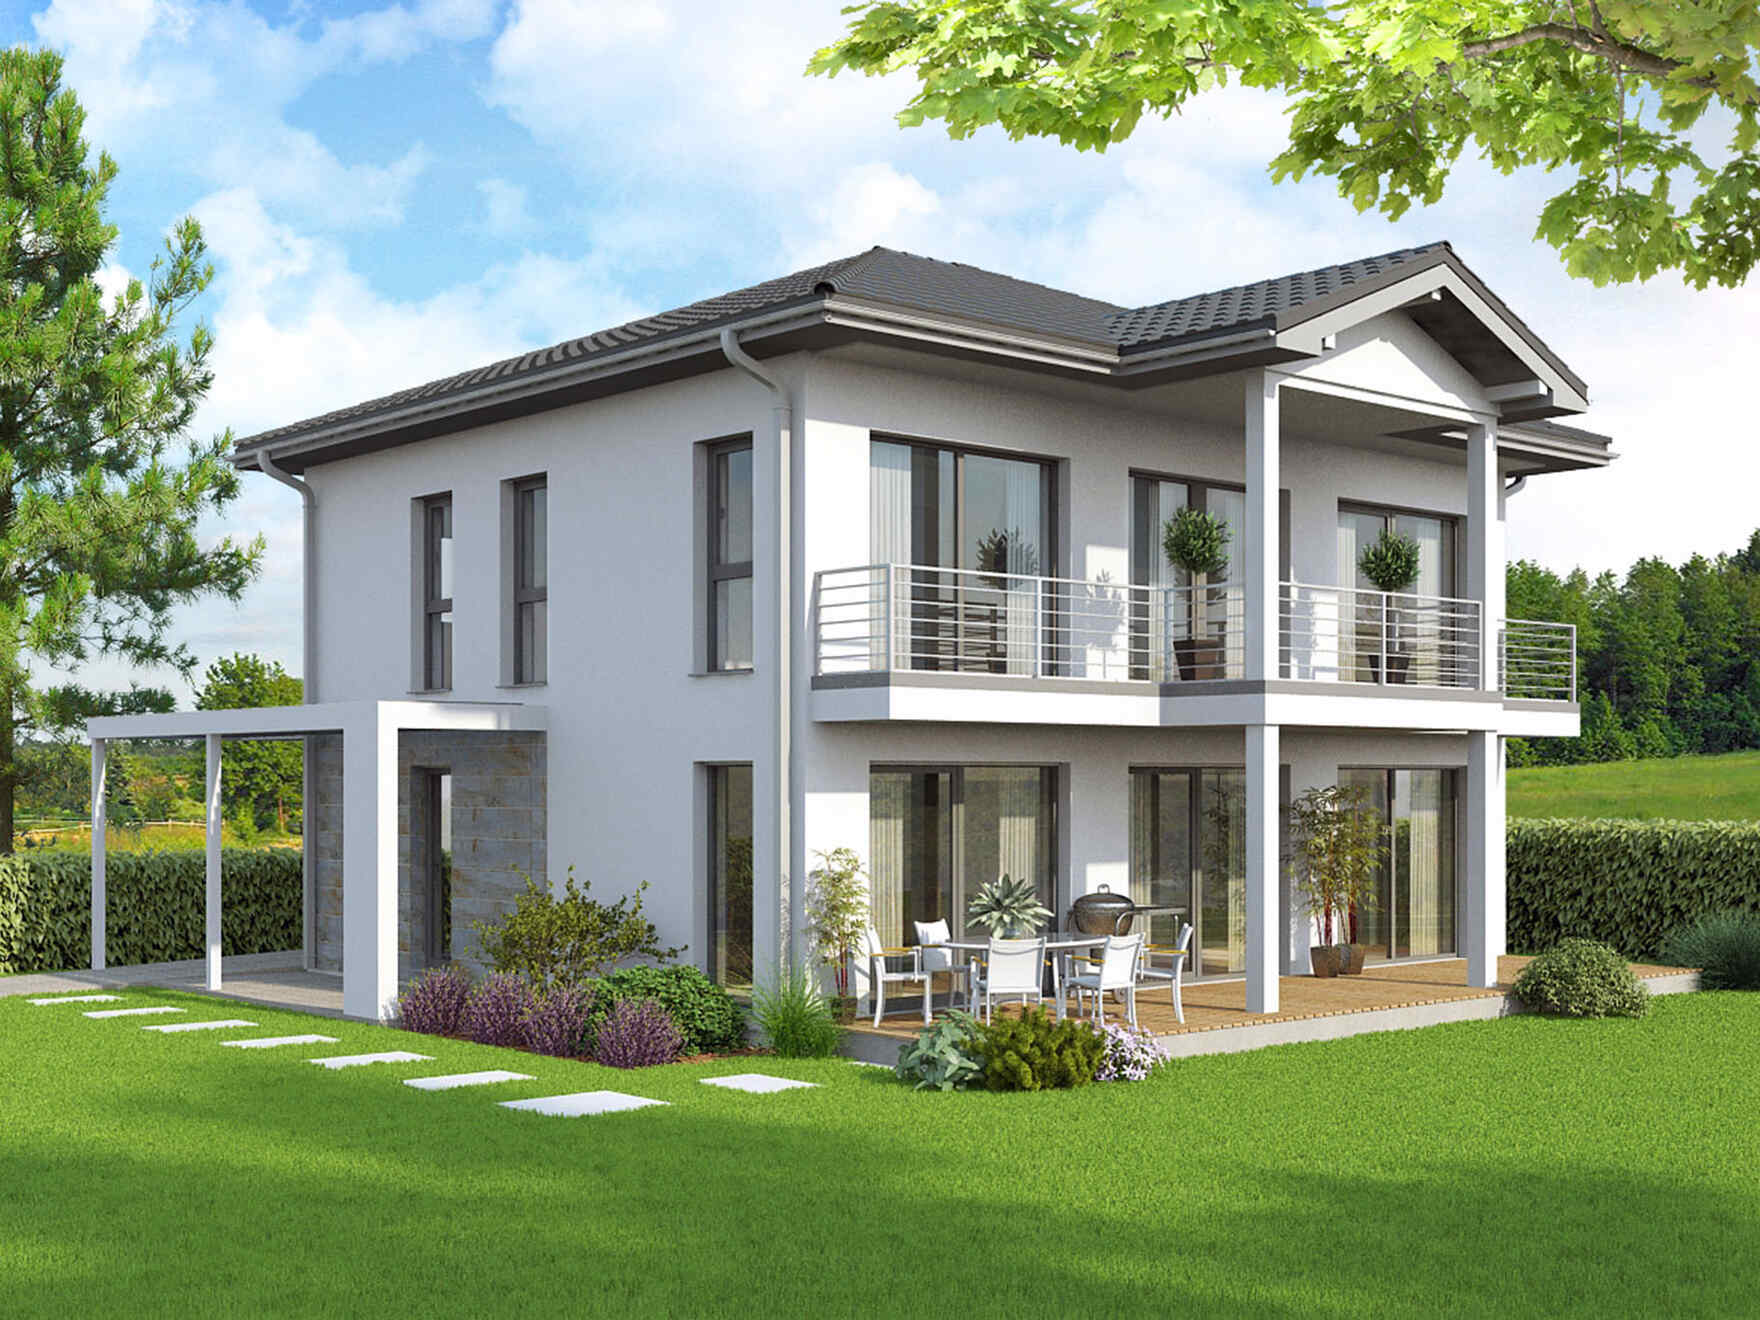 tiny house design fertighaus preisliste. Black Bedroom Furniture Sets. Home Design Ideas